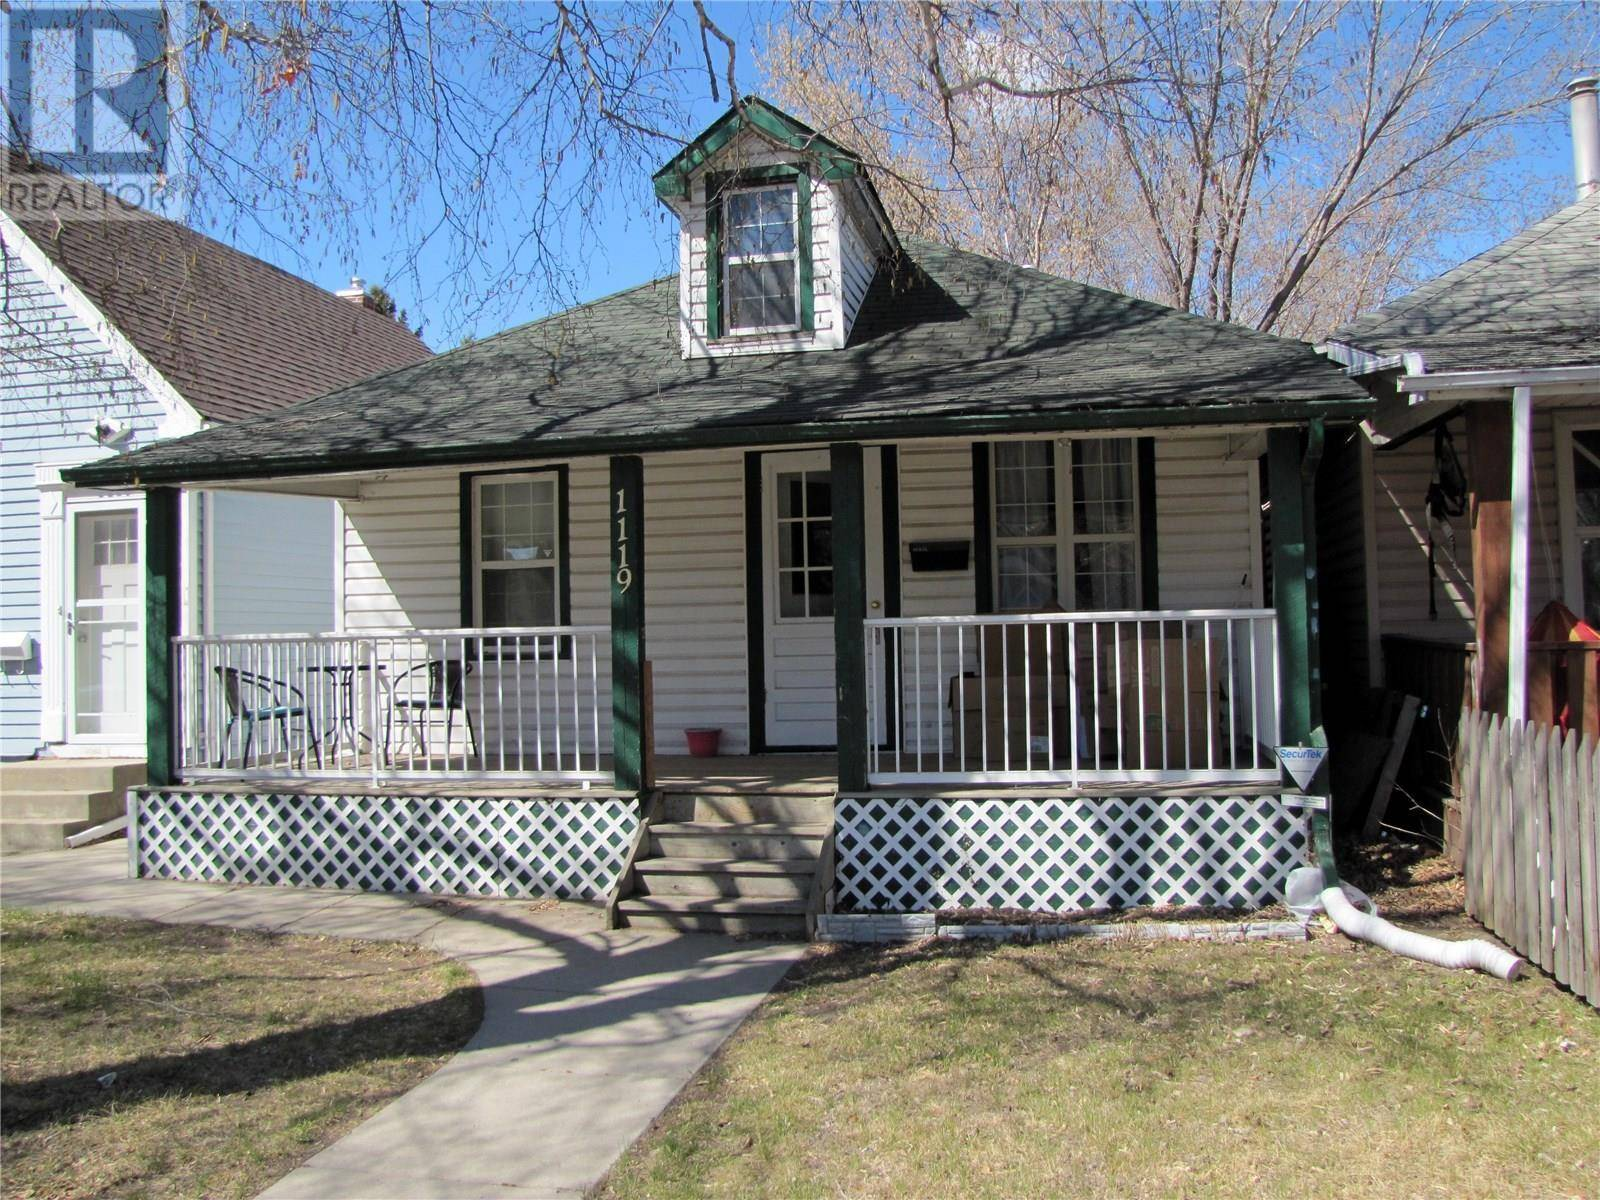 House for sale at 1119 H Ave N Saskatoon Saskatchewan - MLS: SK771016